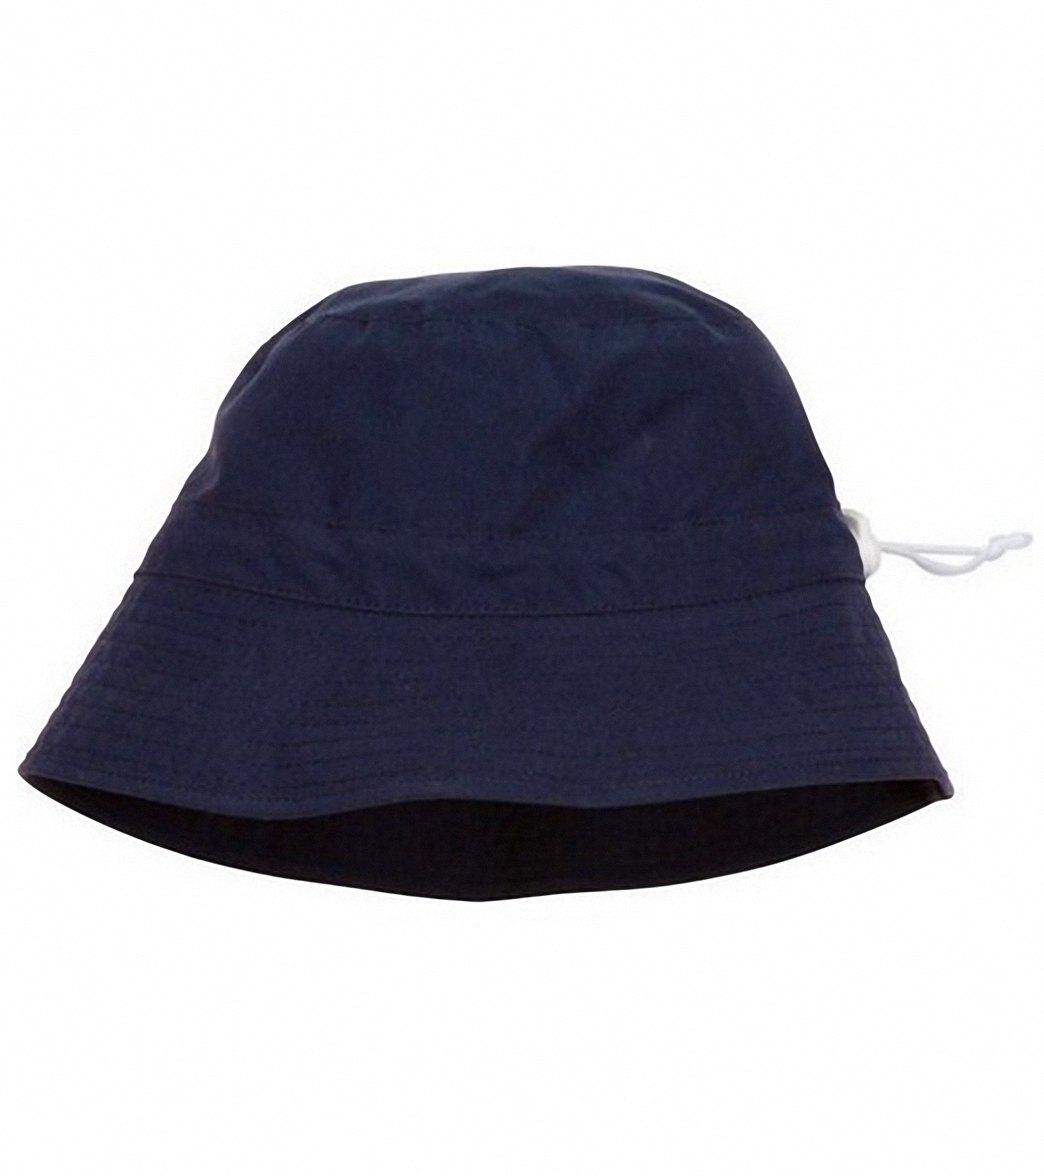 6dd19dbb2 Snapper Rock Kids' Navy Bucket Hat